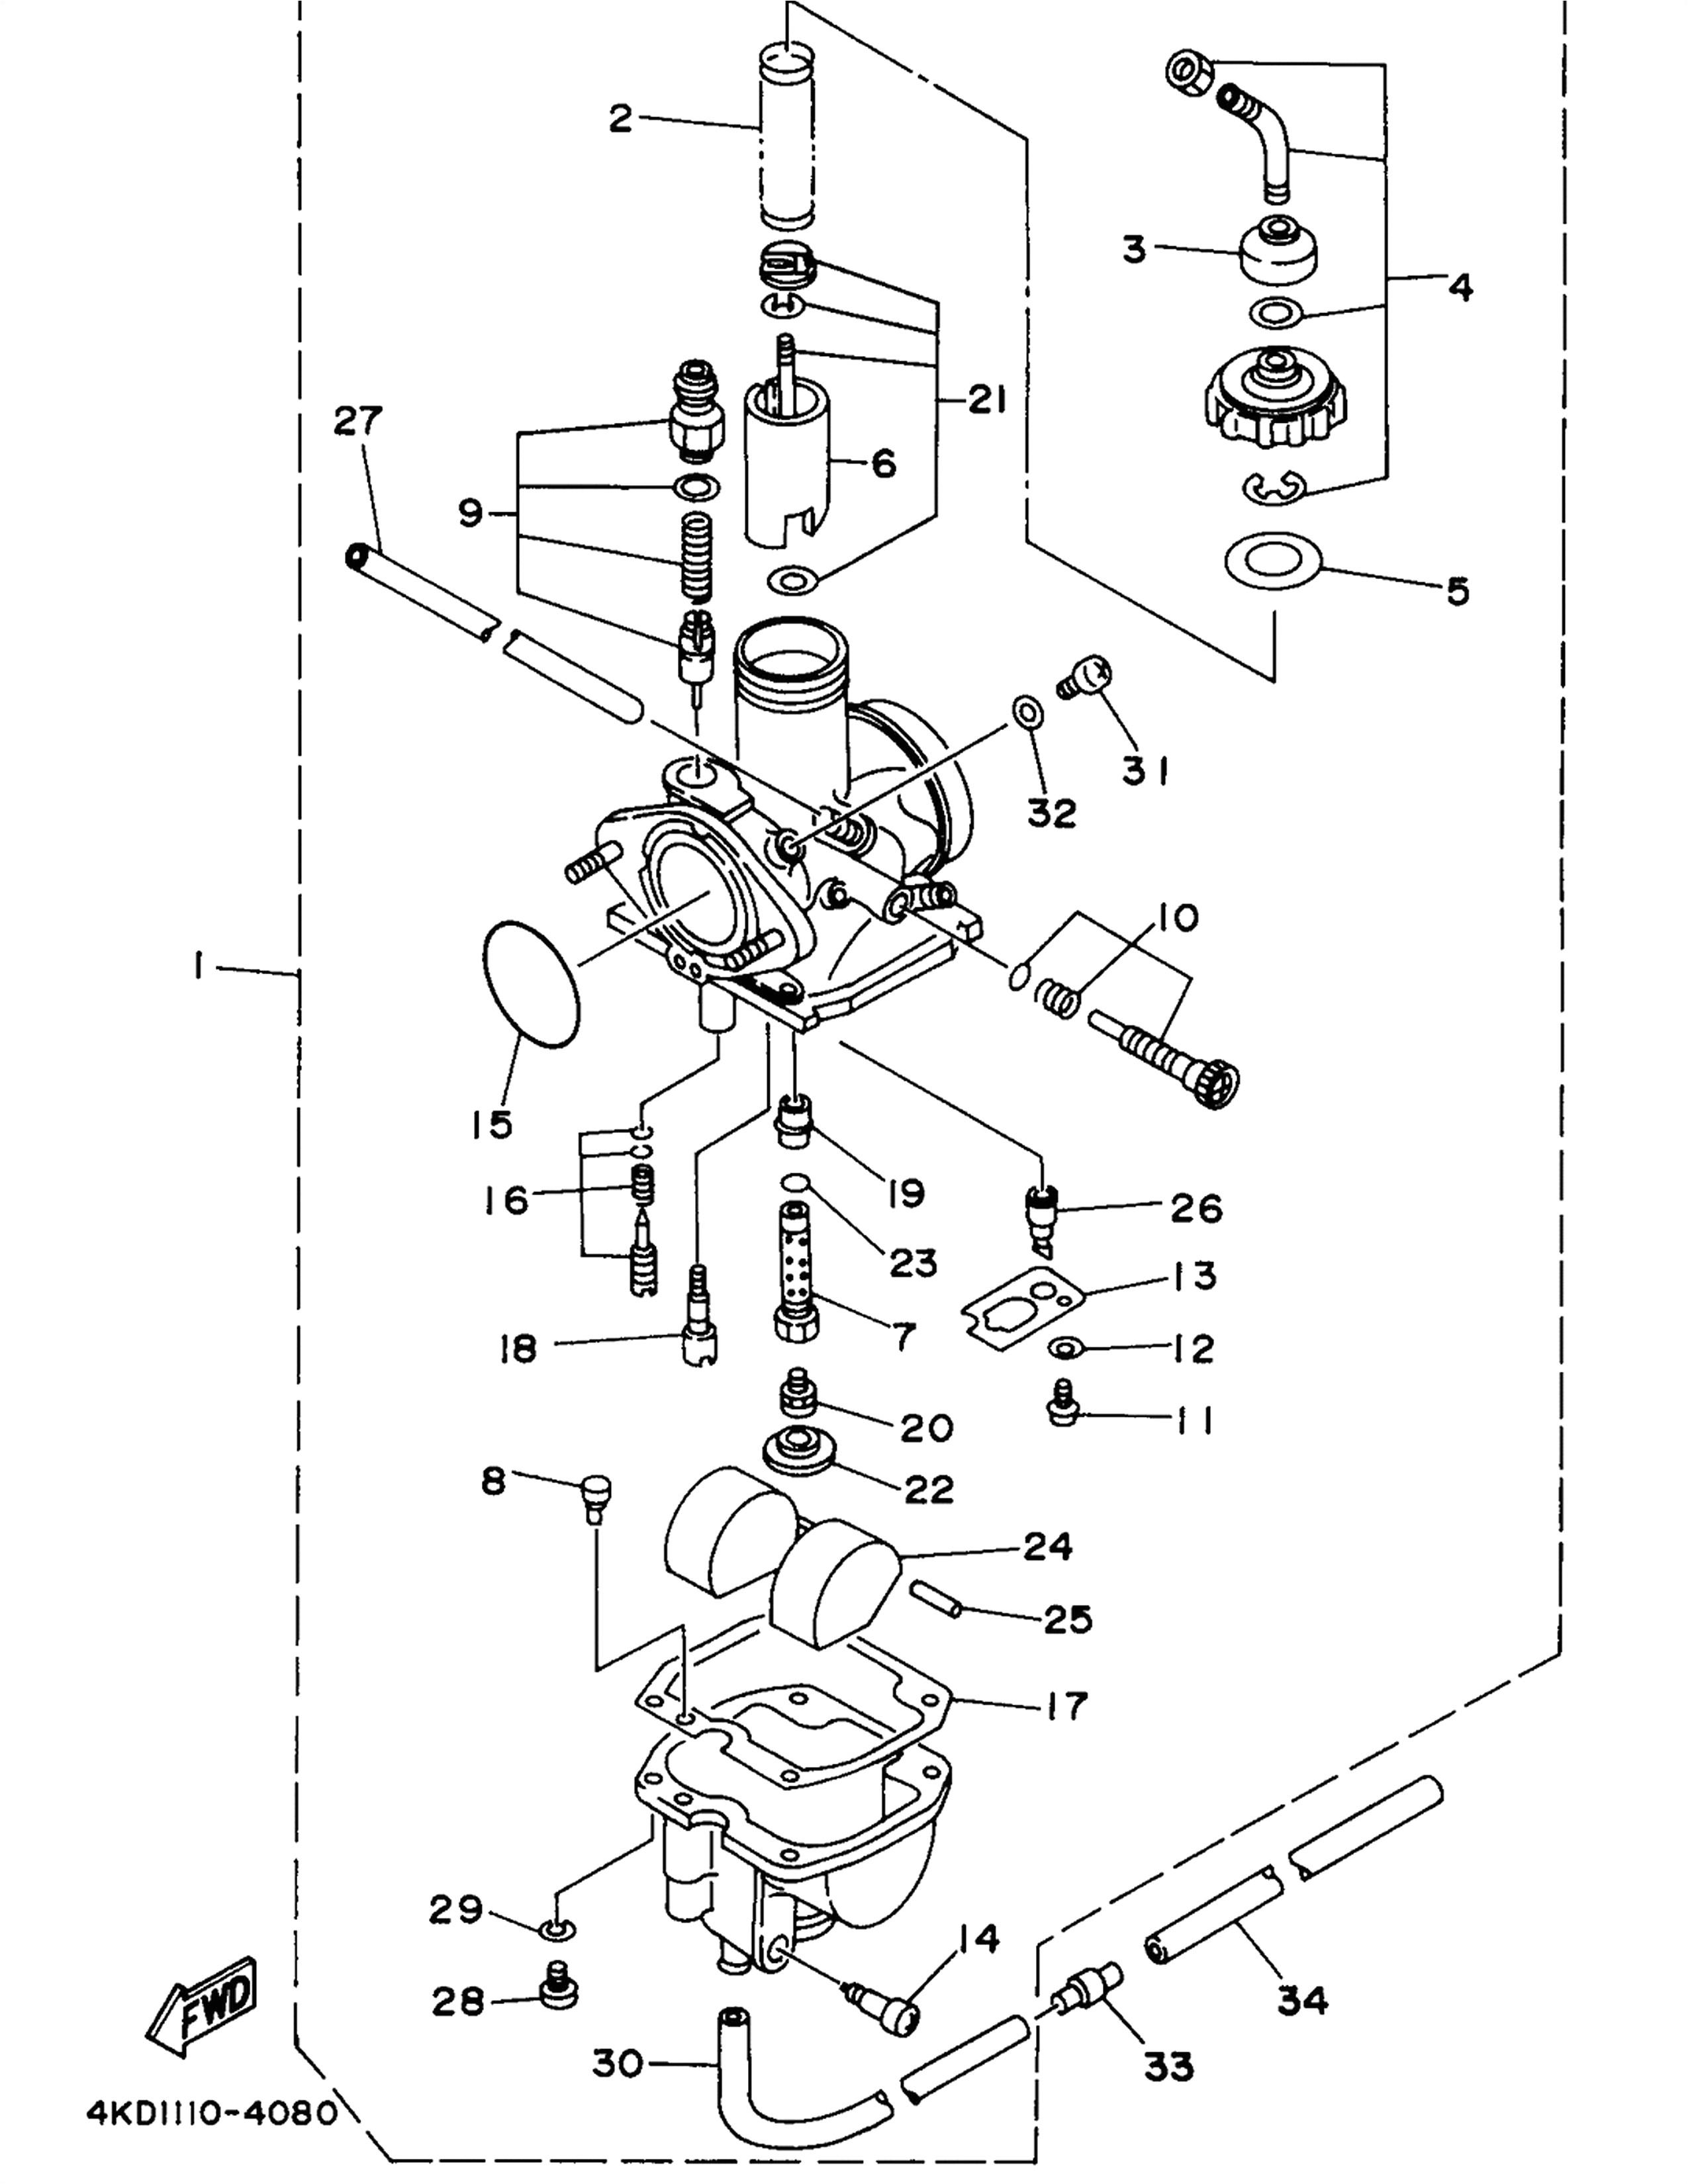 download image 2001 mitsubishi montero sport engine diagram pc 2001 mitsubishi montero sport engine diagram 2001 mitsubishi engine diagram